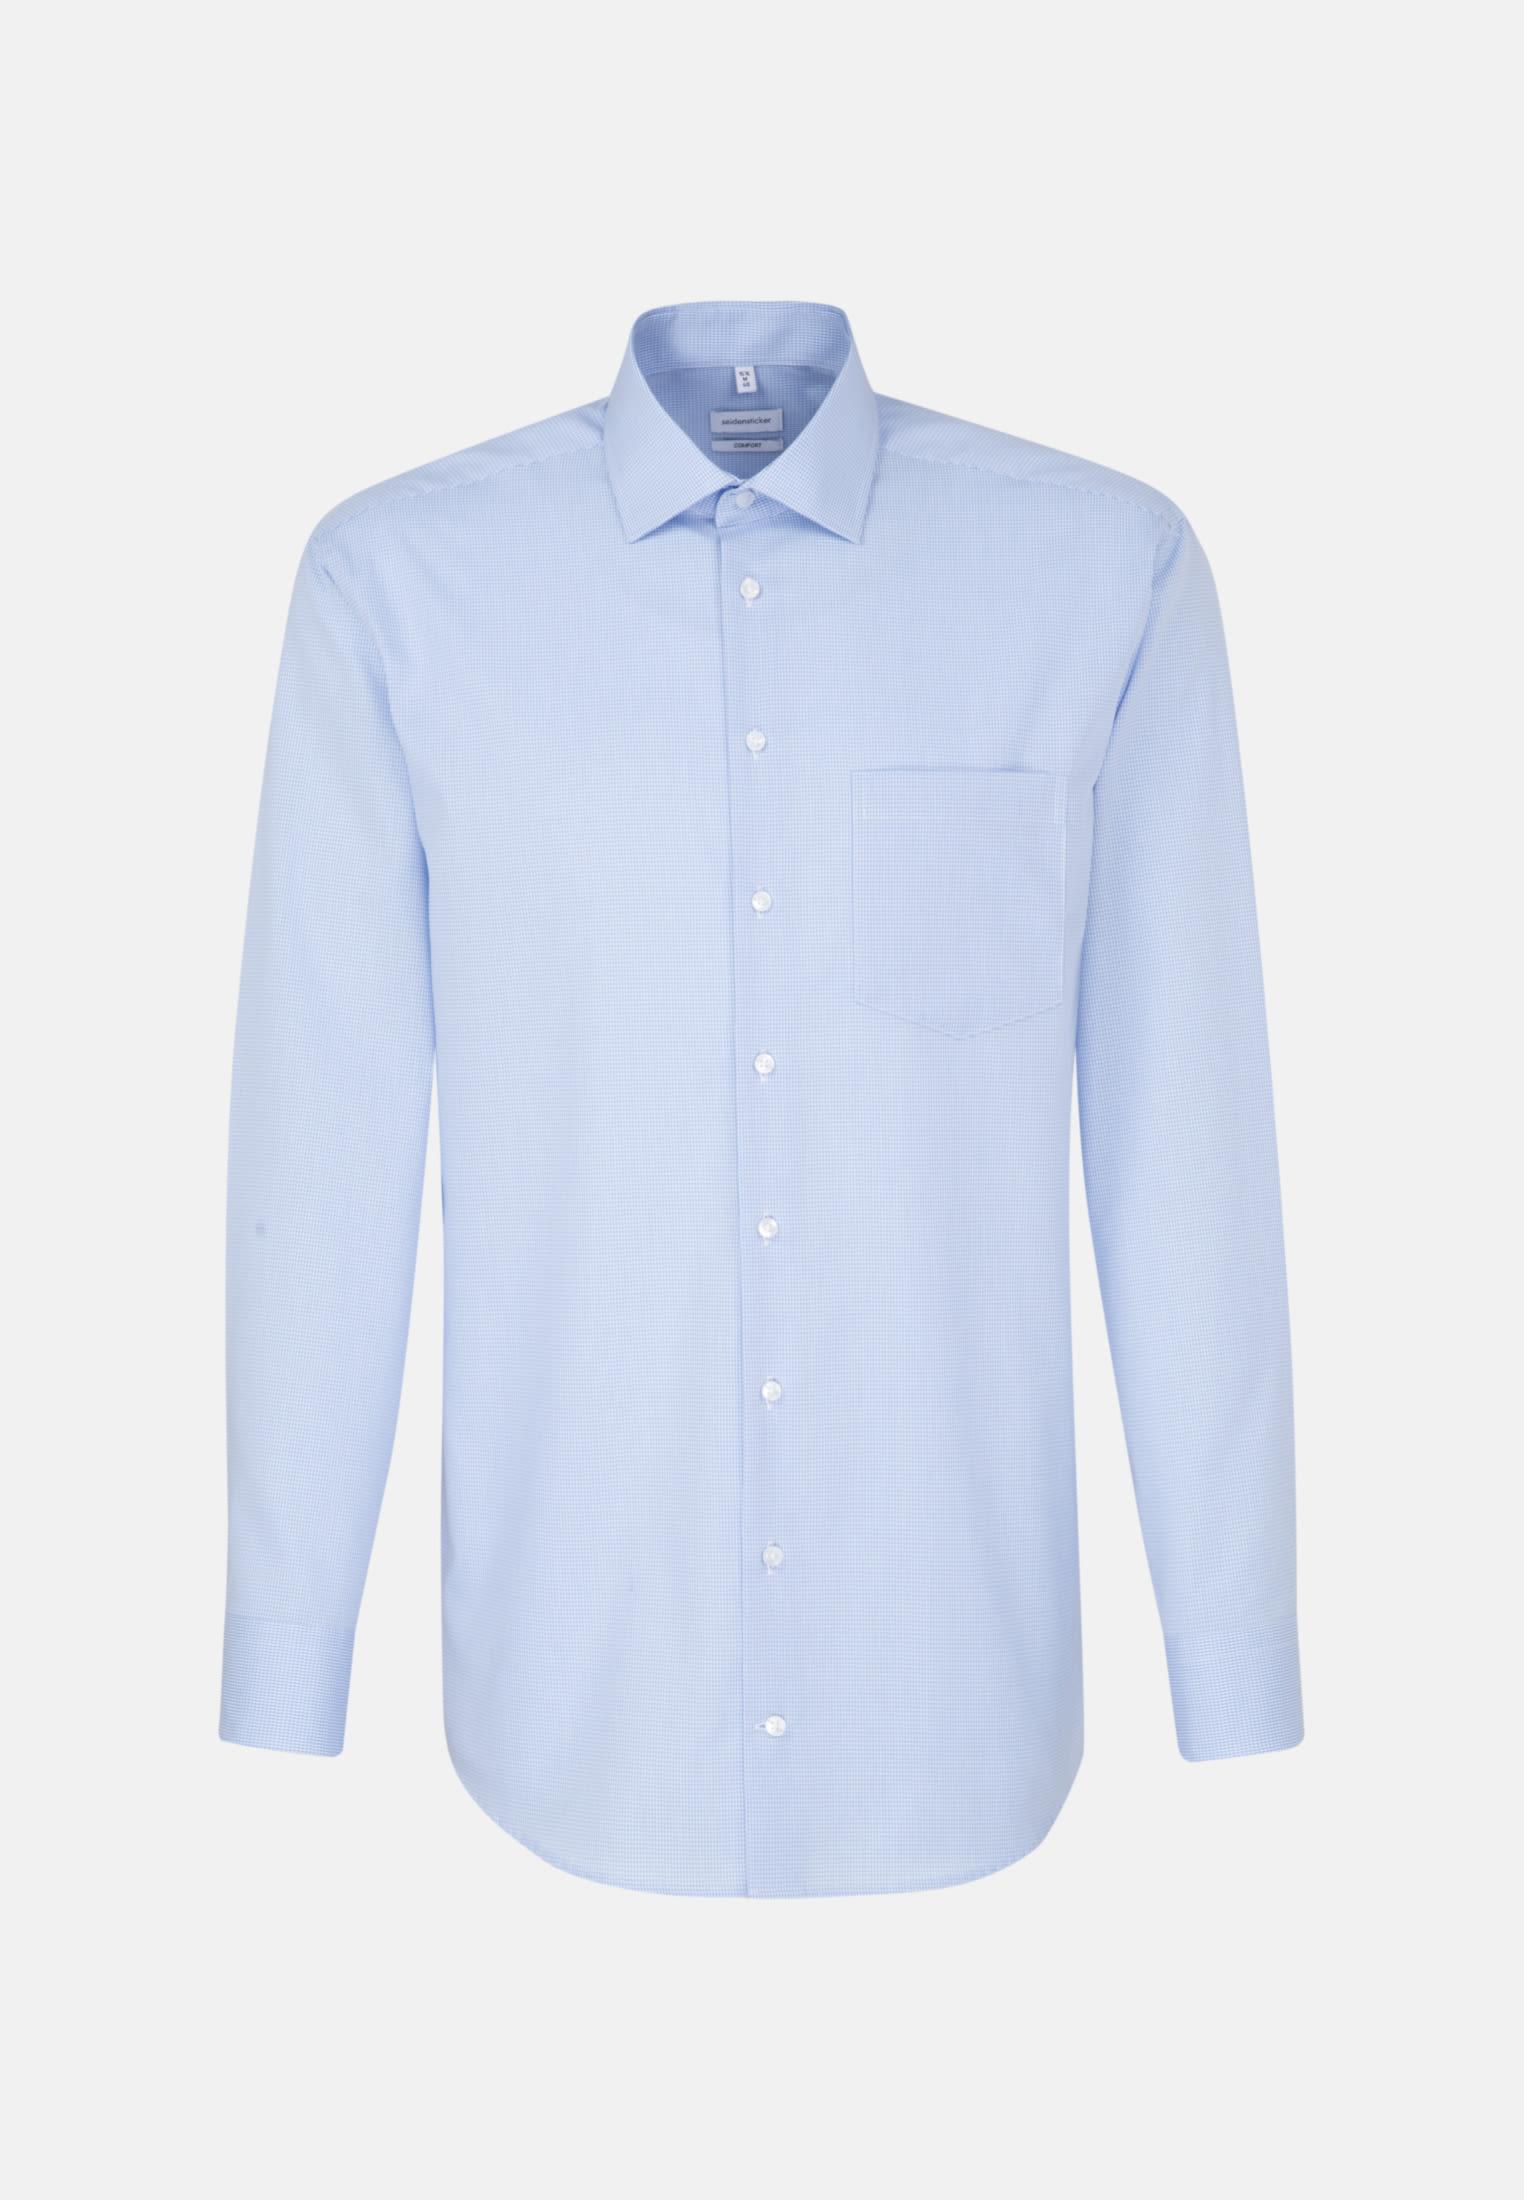 Bügelfreies Popeline Business Hemd in Comfort mit Kentkragen in Hellblau |  Seidensticker Onlineshop